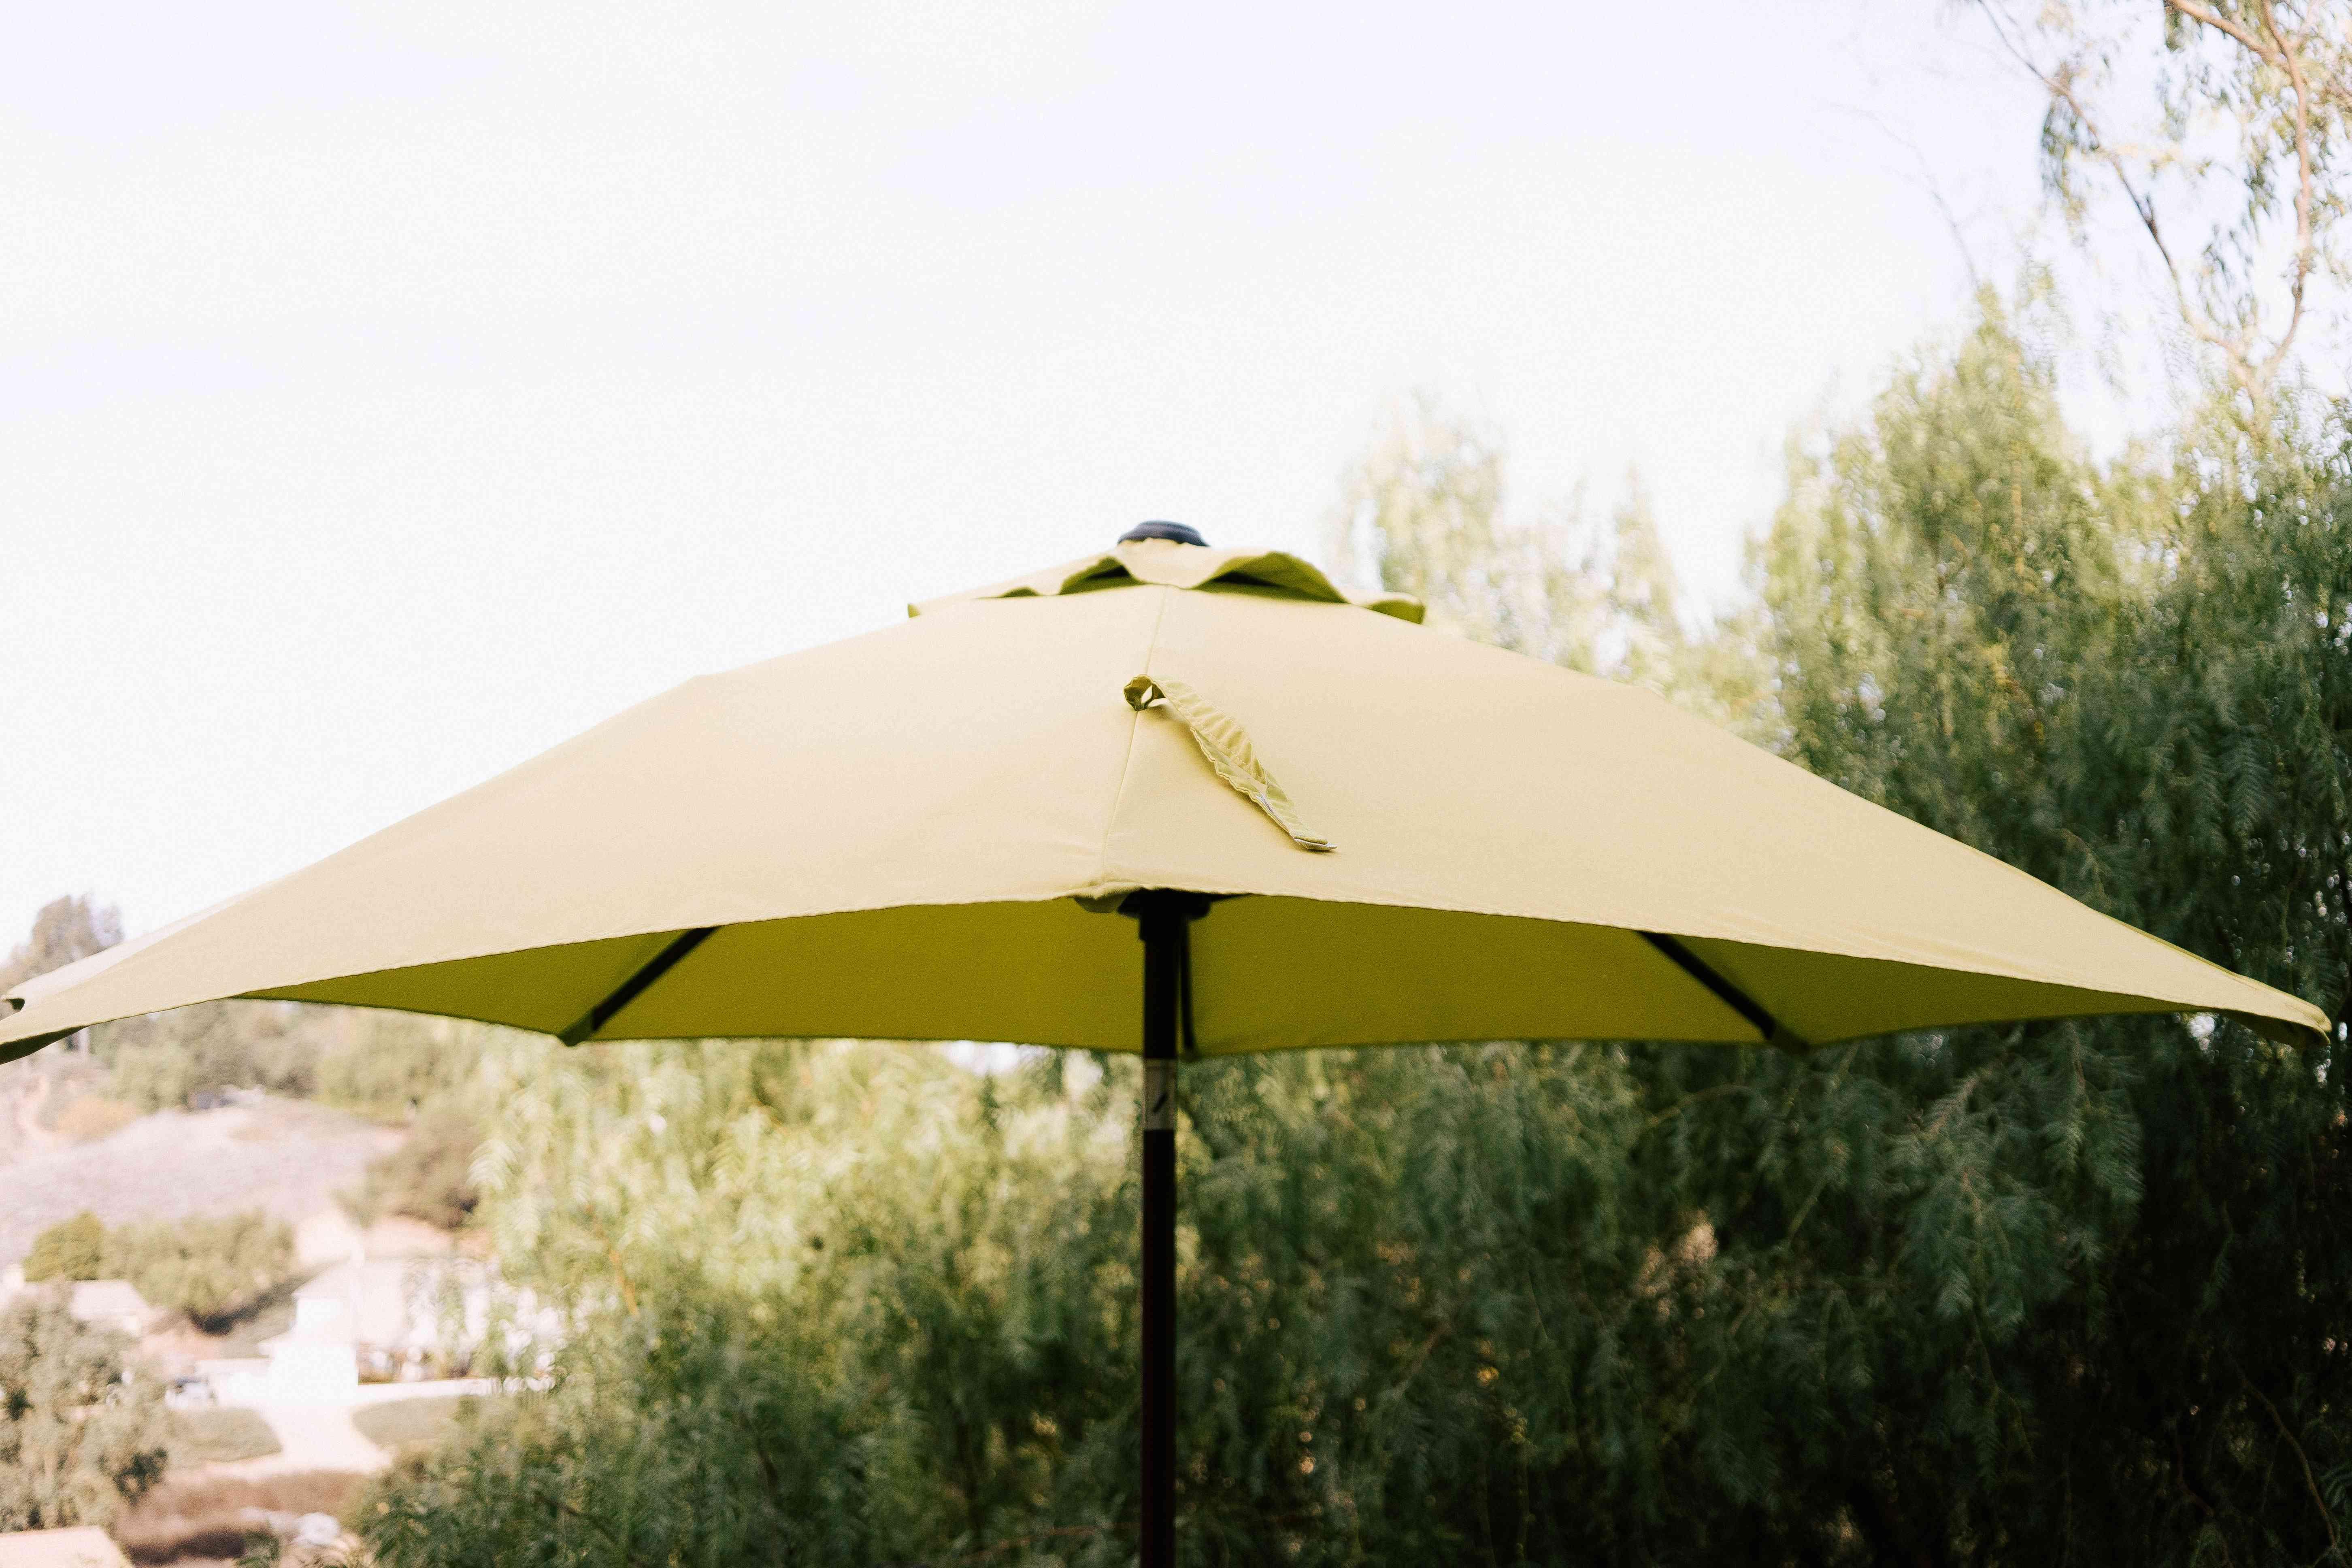 letting the umbrella dry